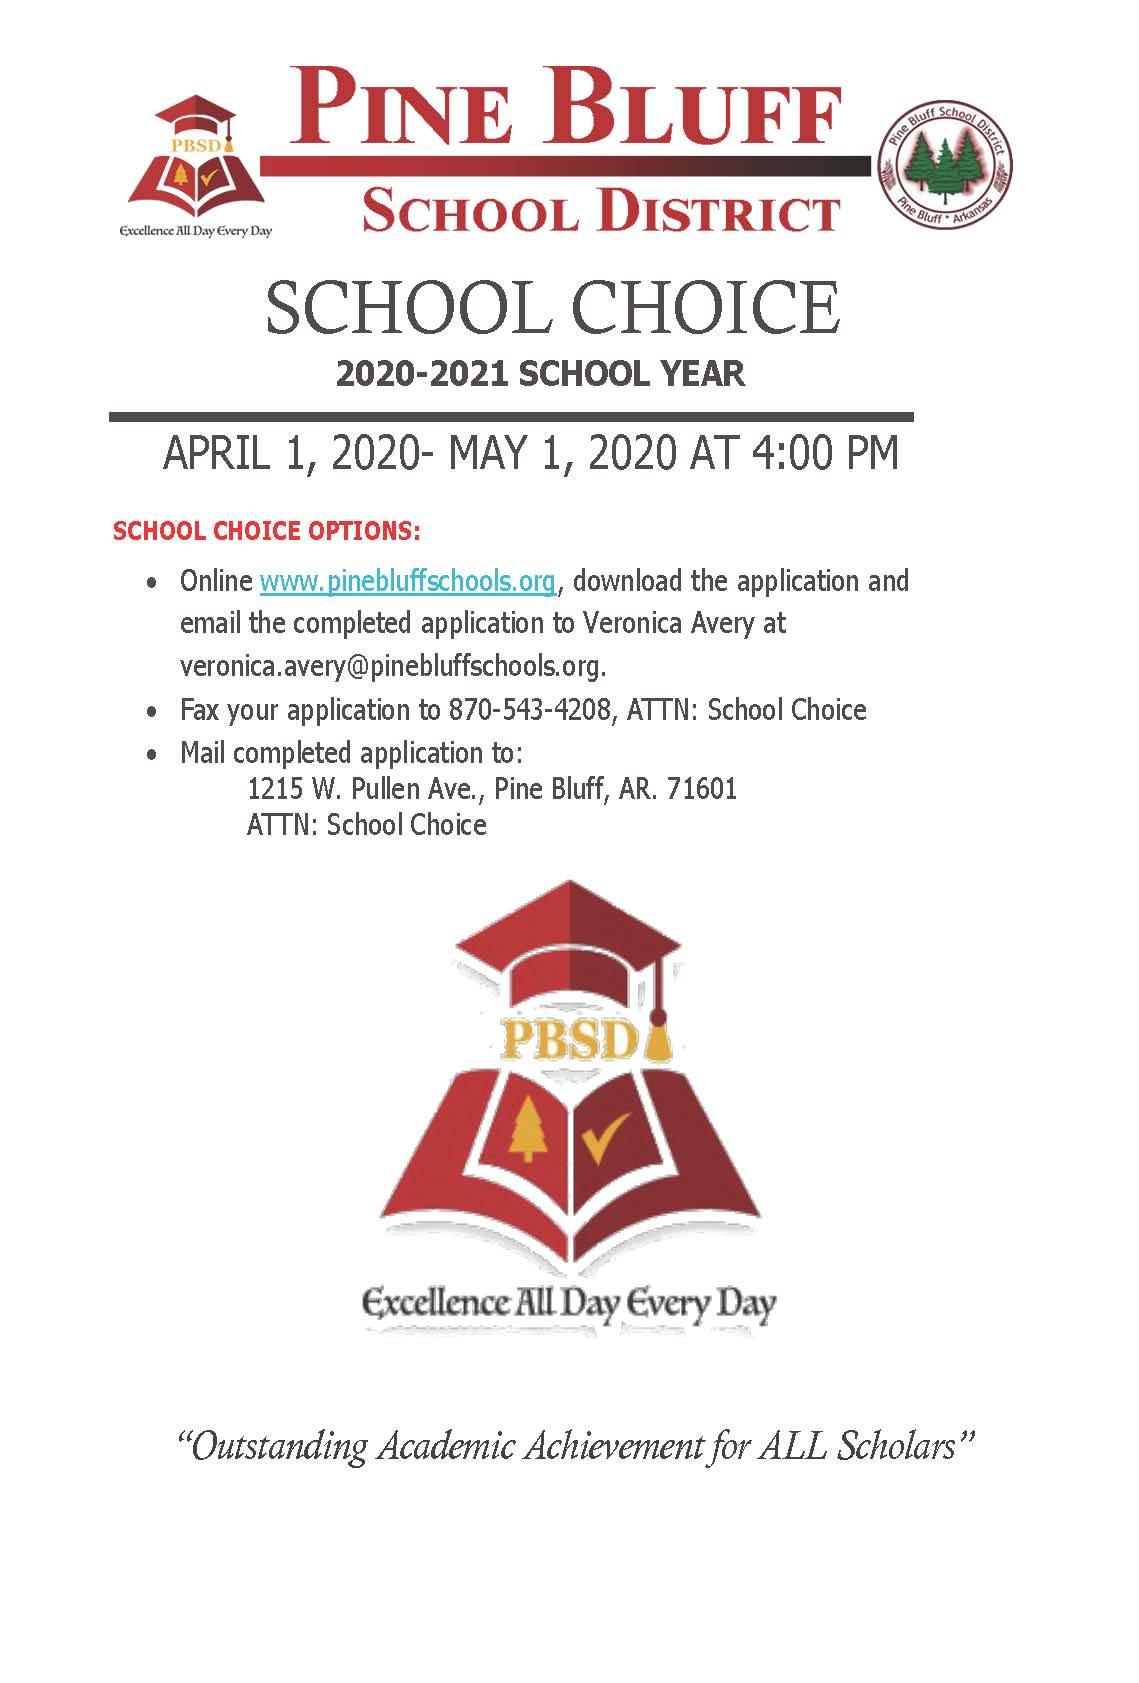 School Choice - Pine Bluff School District Within Pine Bluff School District Calendar